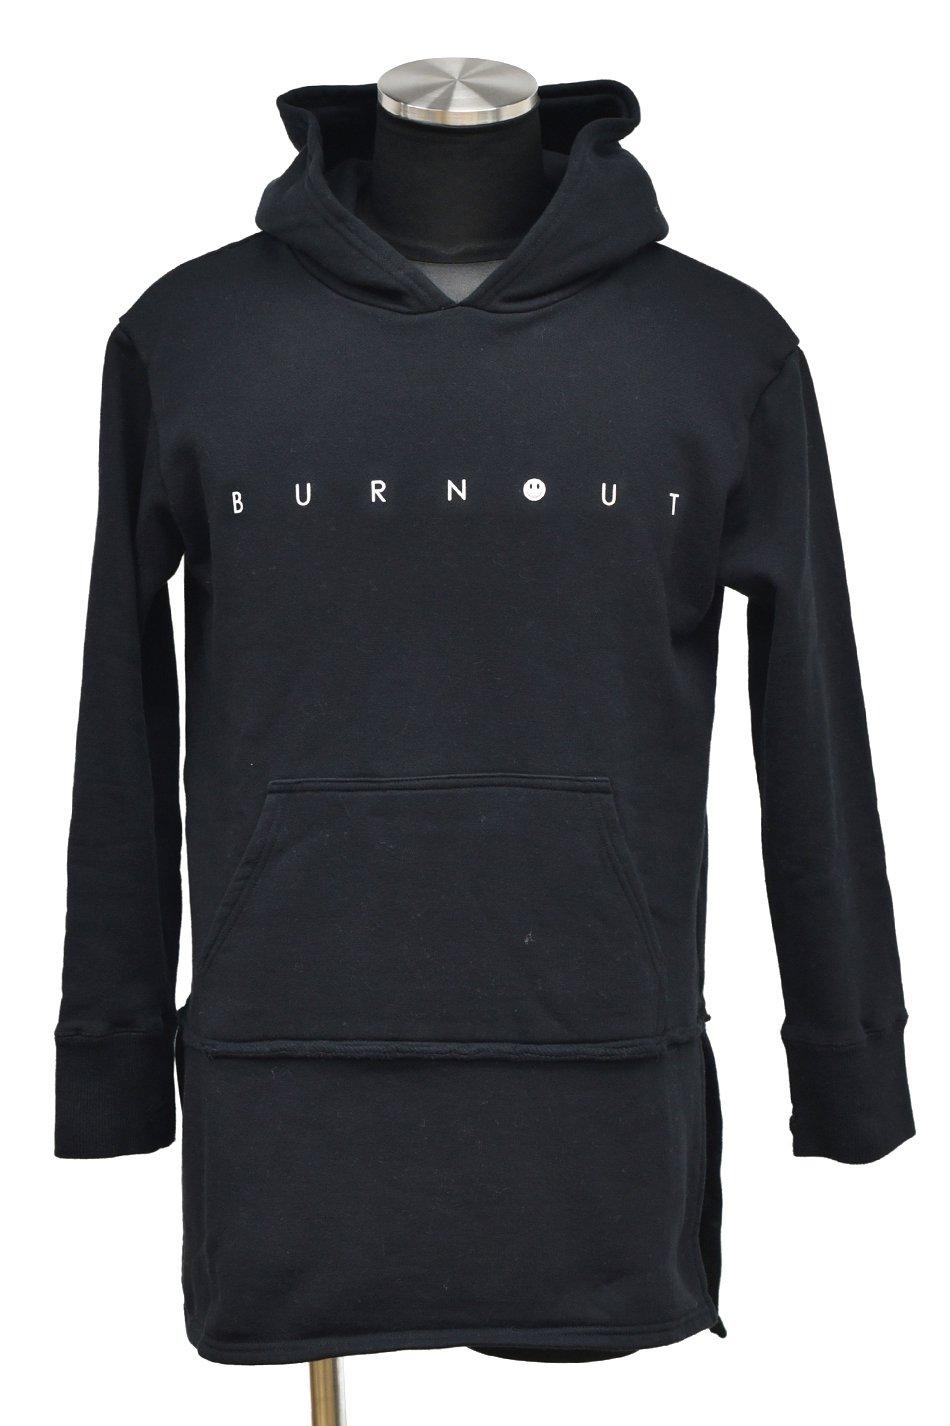 BURNOUT(バーンアウト )【BURNOUT】カットバック フーディー / ブラック